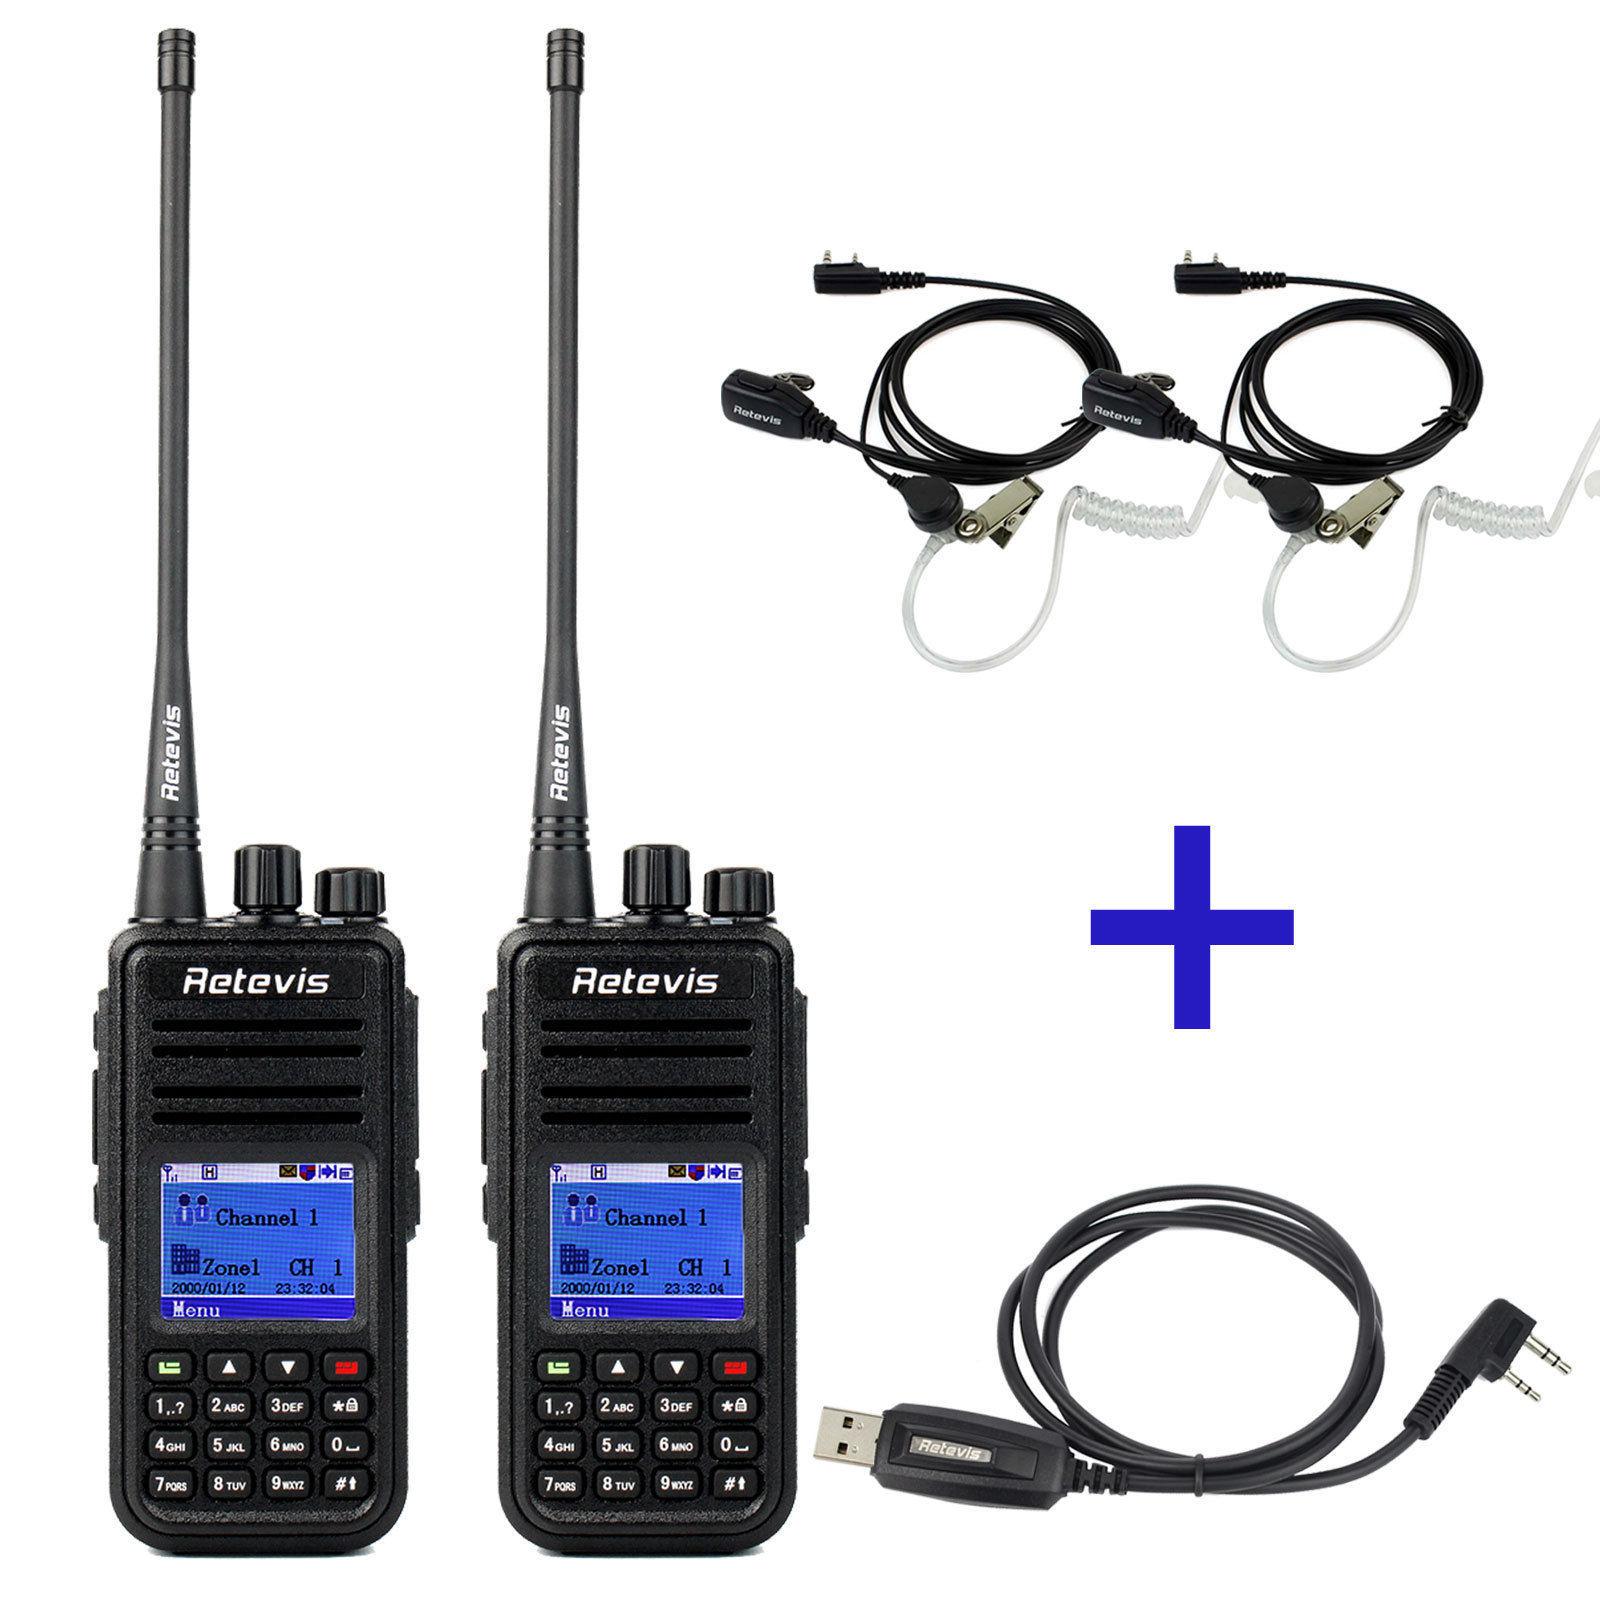 2x retevis rt3 dmr radio uhf 400 480mhz digital ham radio for Radio boden 98 2 mhz